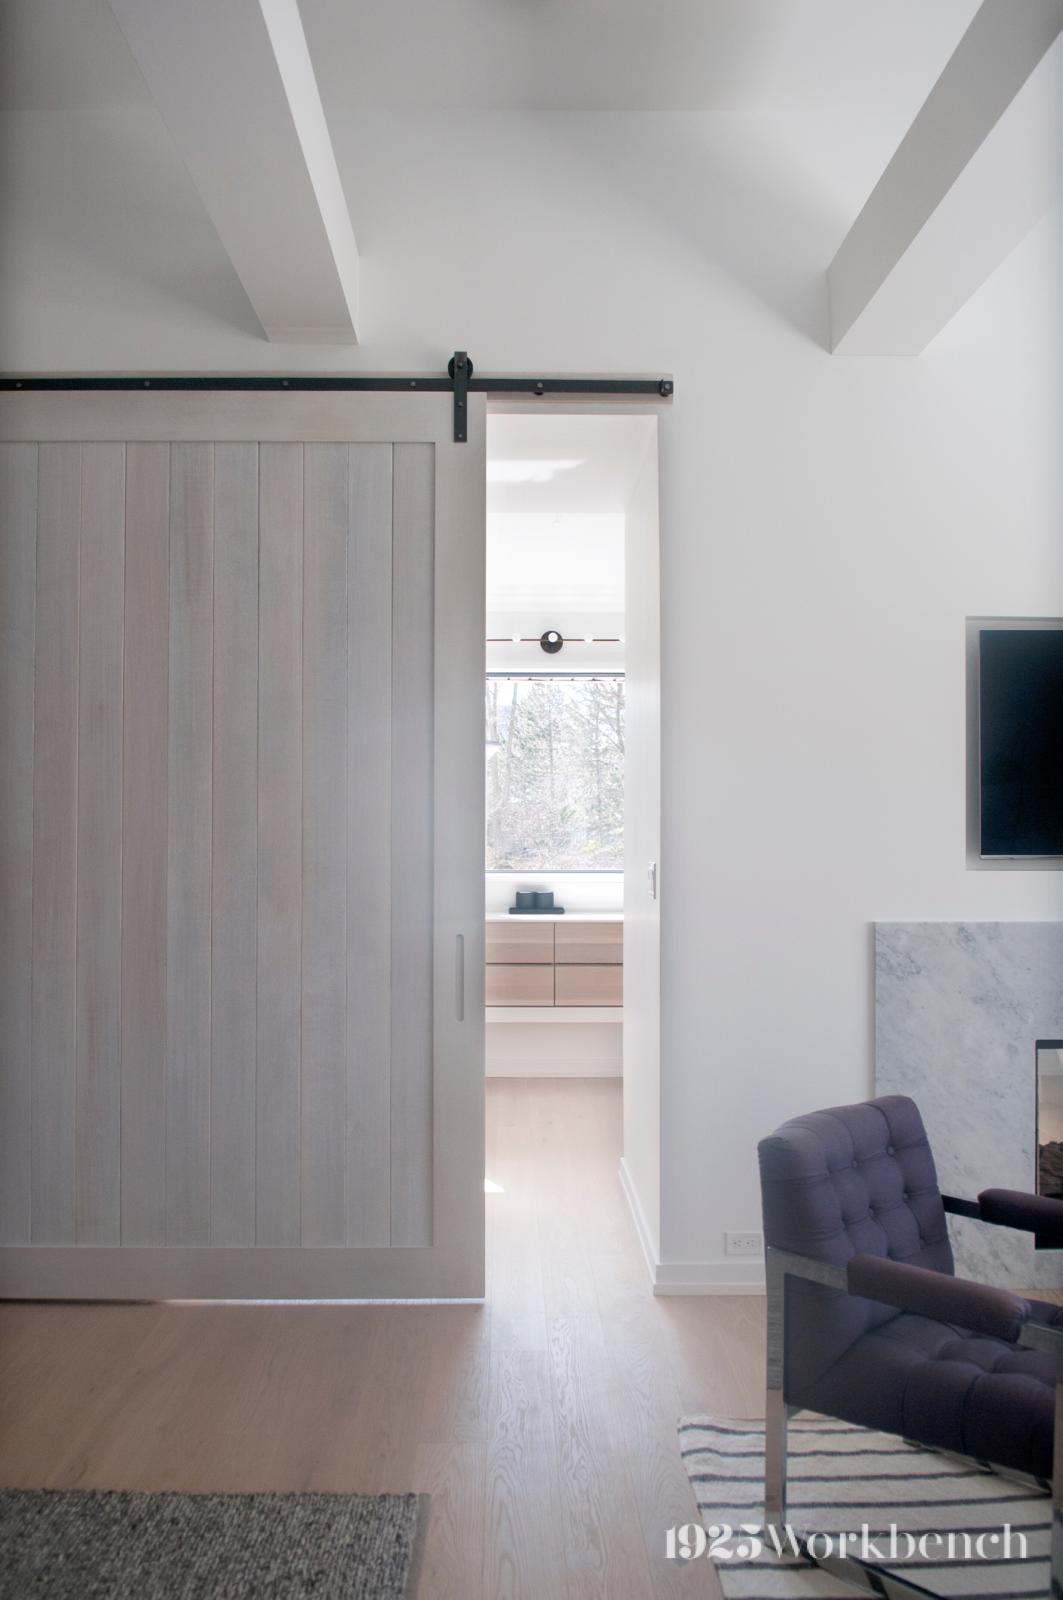 We Made Doors And Vanity For House Designed By Studio Ac Barndoors Whiteoak Vanity 1925workbench Custom Barn Doors Barn Door Custom Door